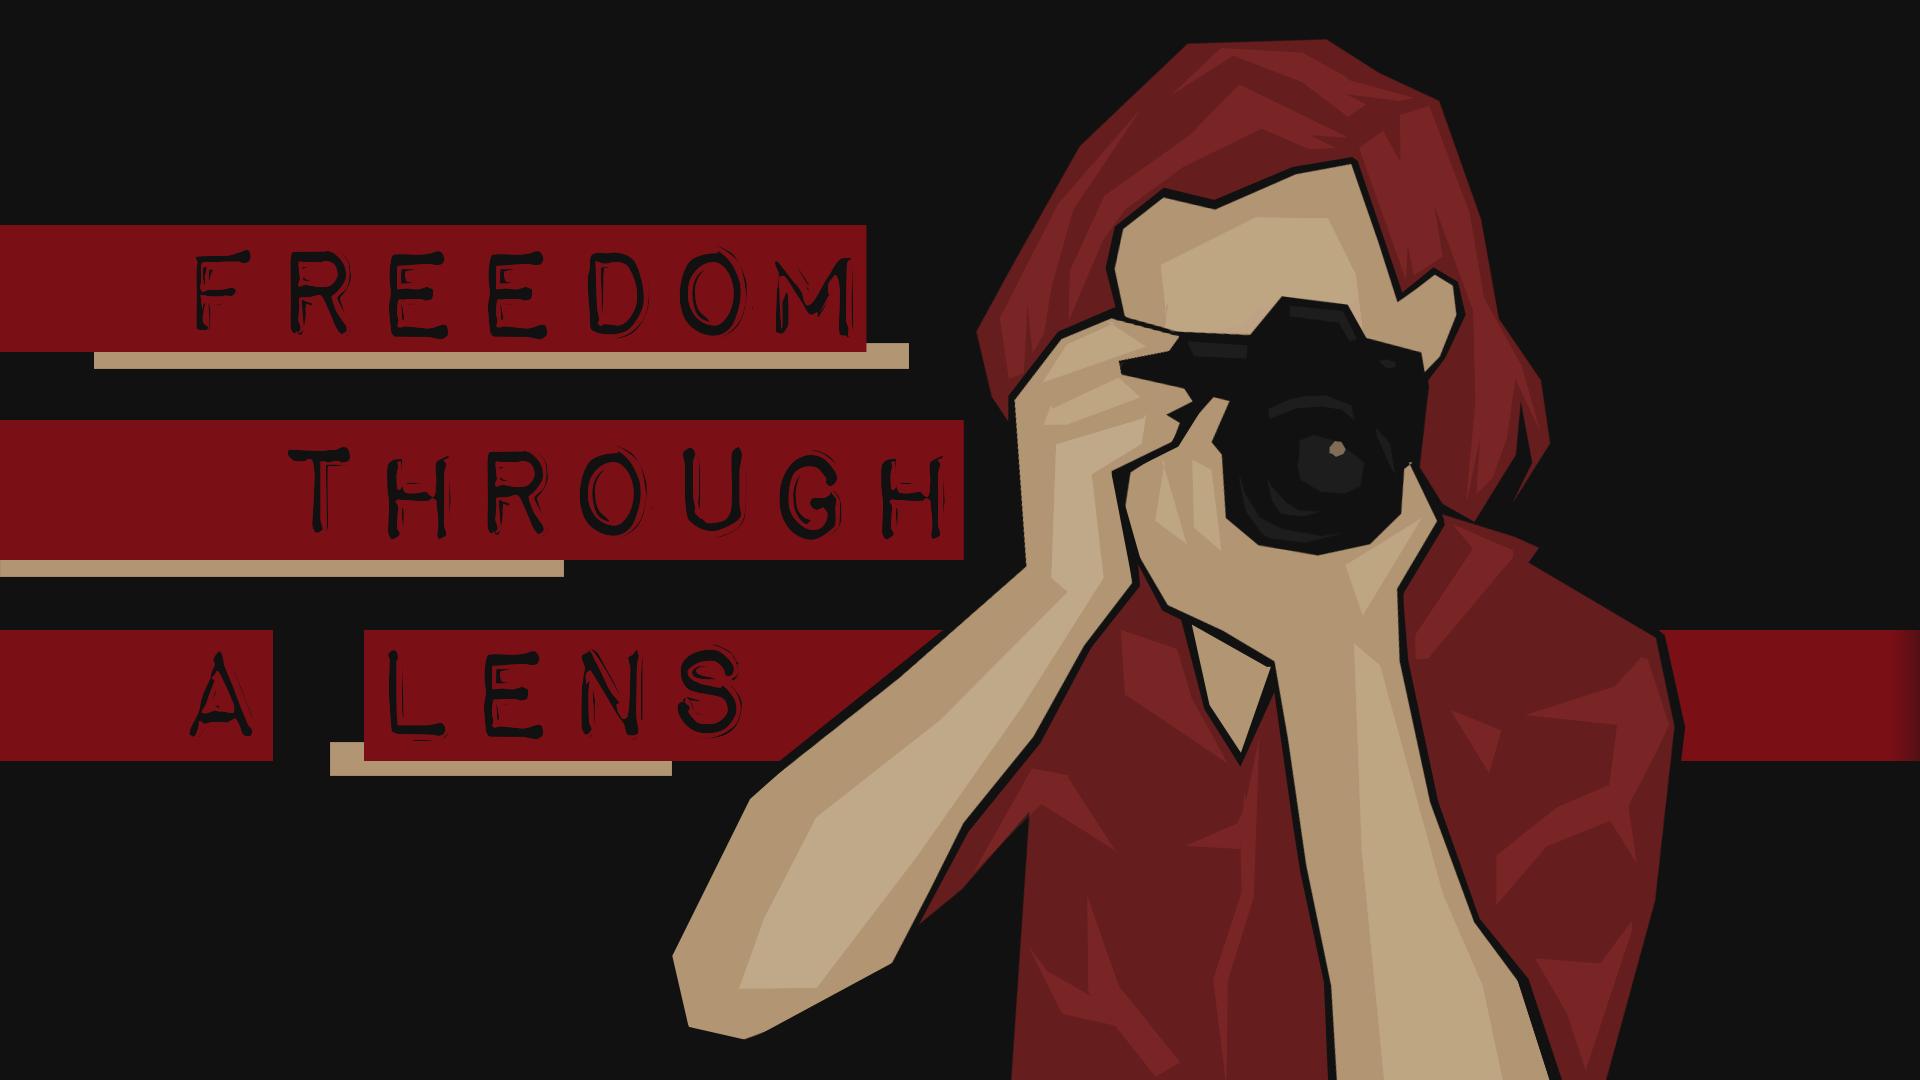 Freedom Through A Lens